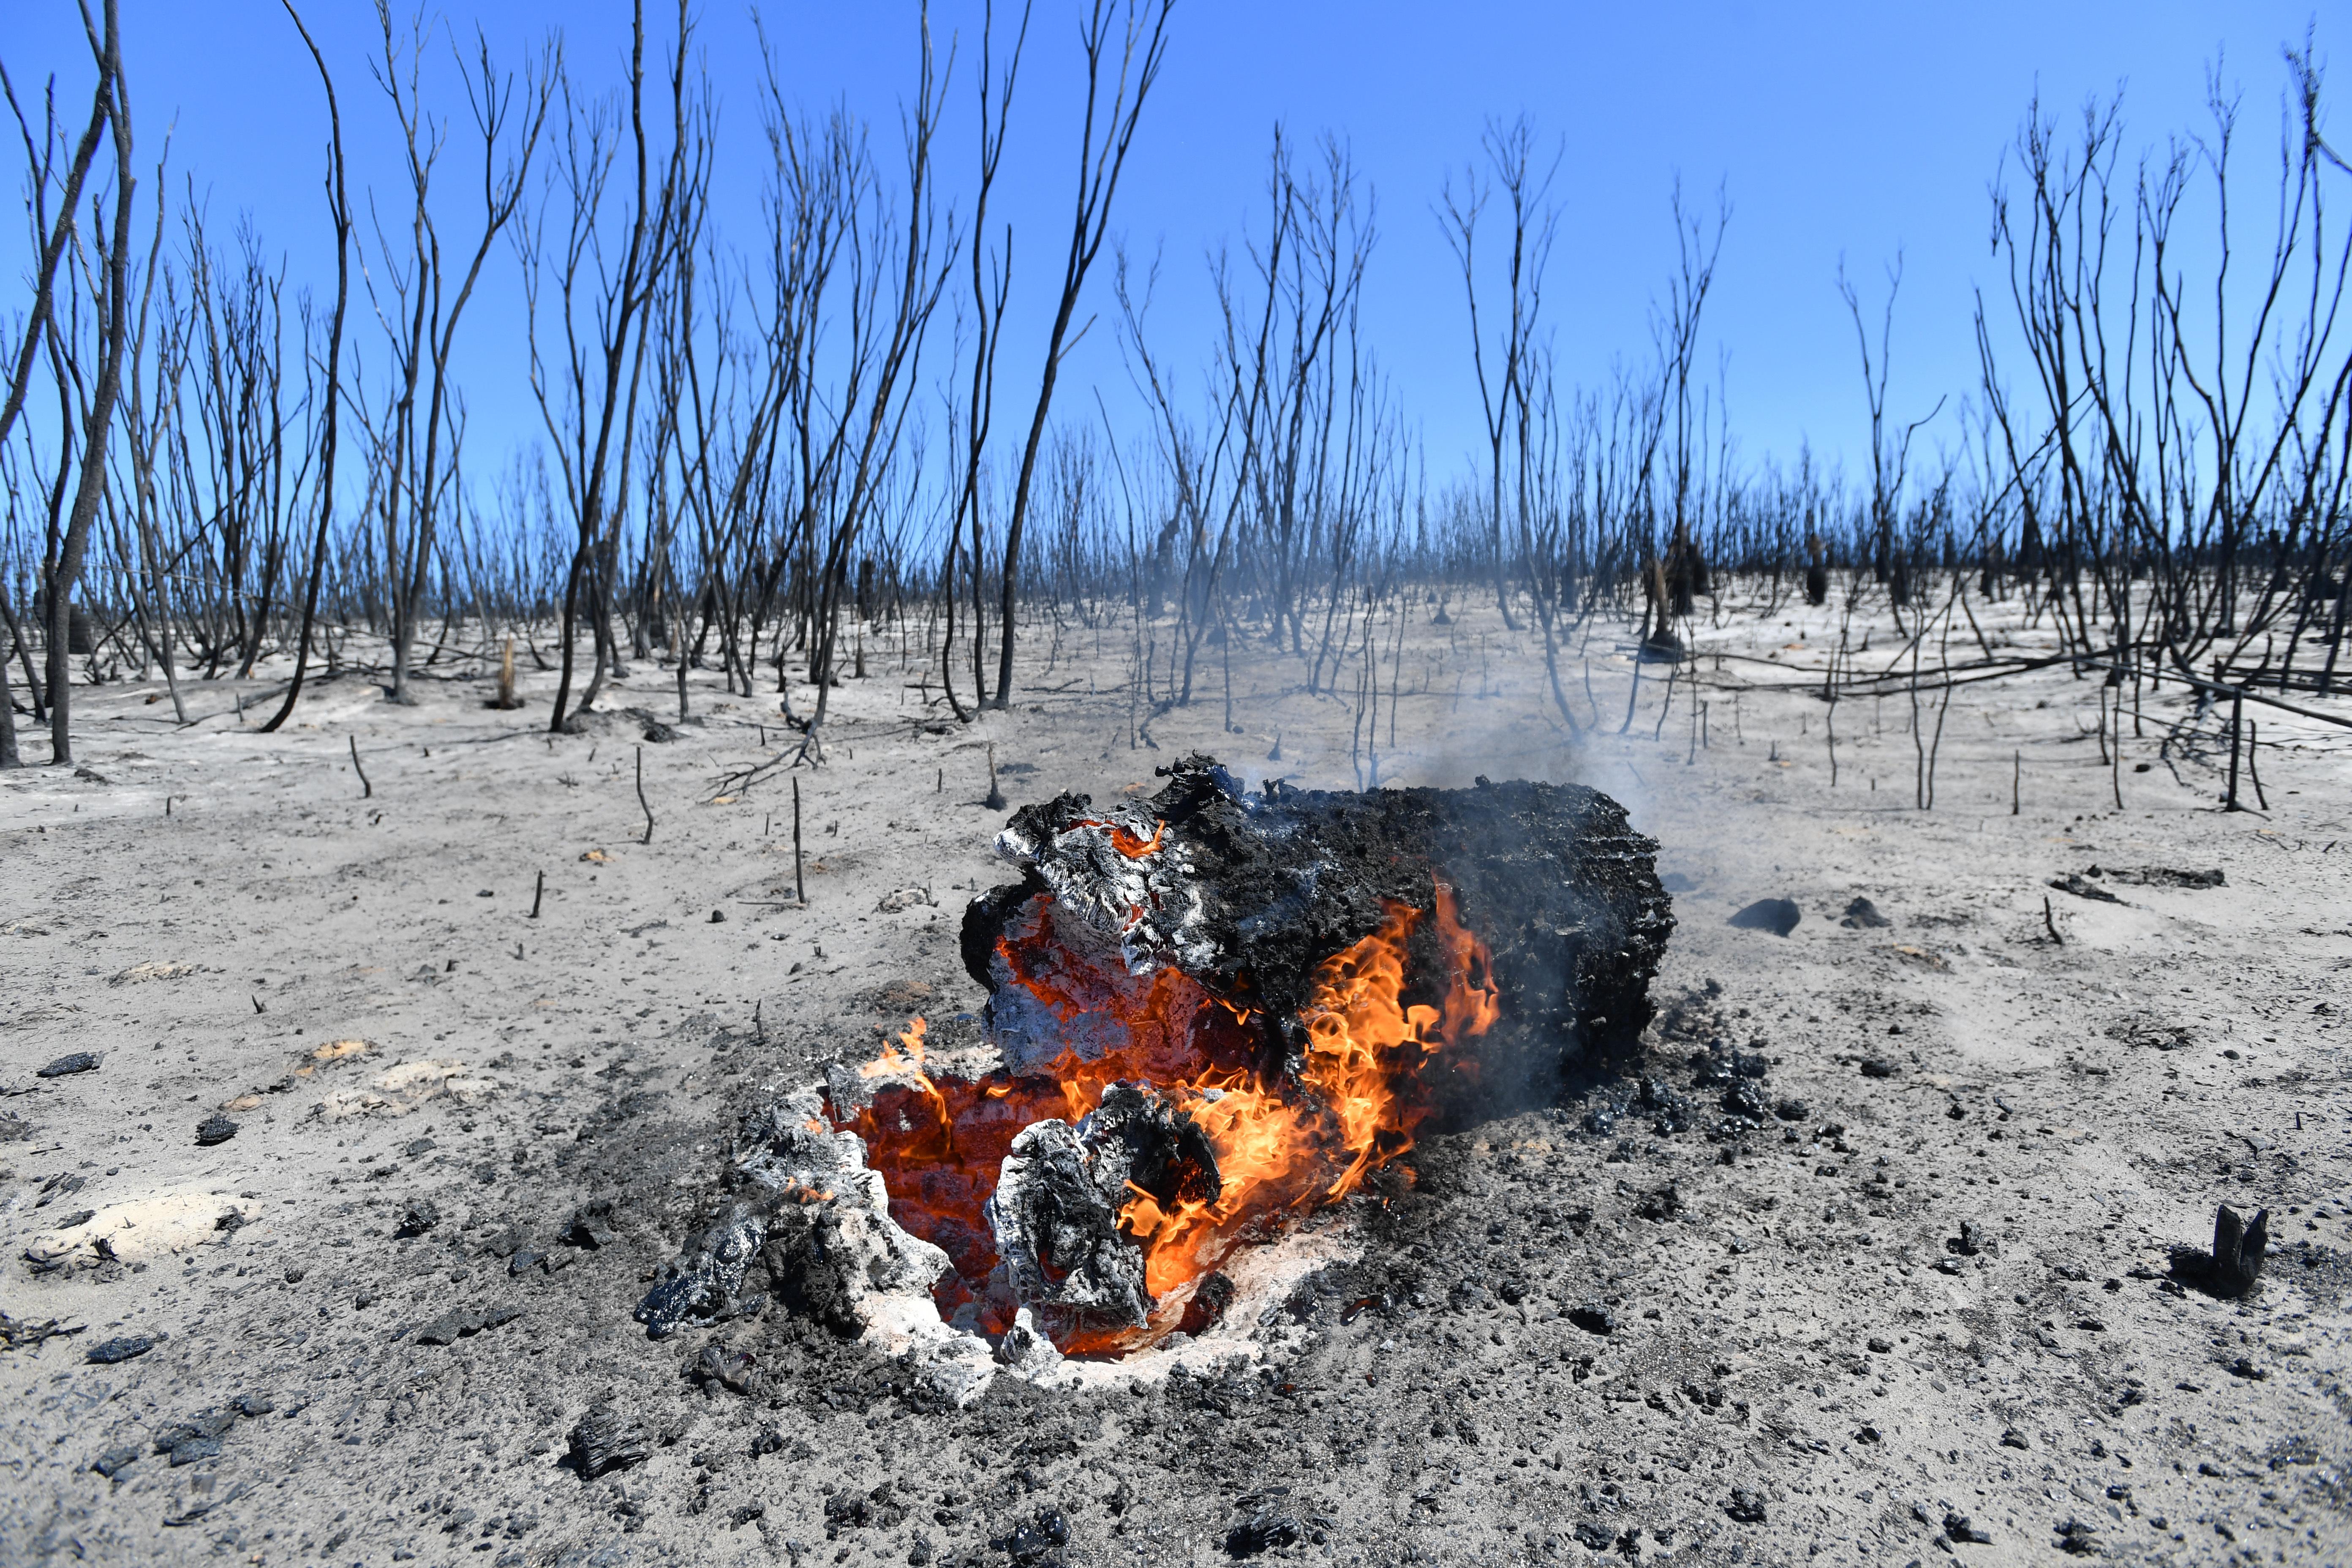 Damage in the Flinders Chase National Park after bushfires swept through on Kangaroo Island.